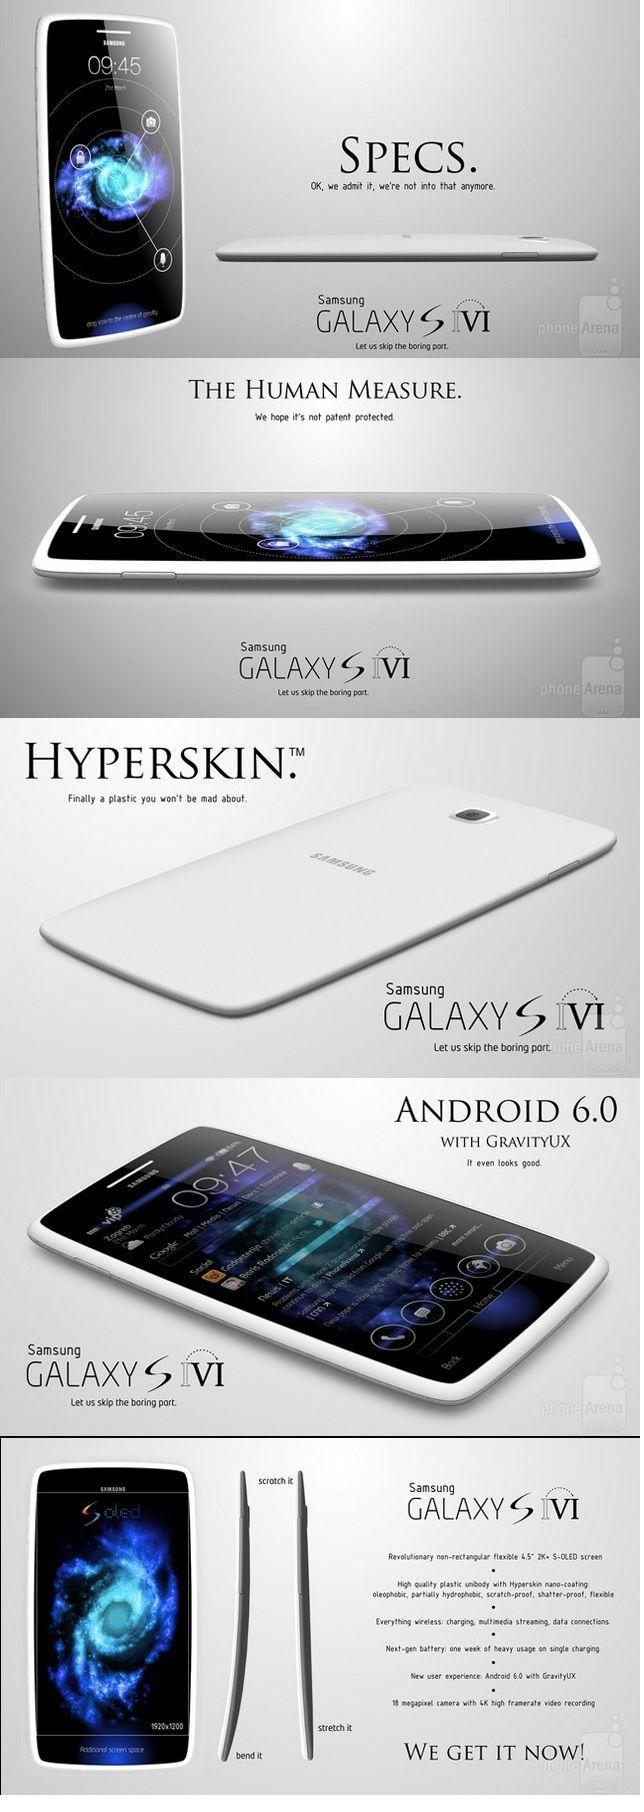 Concept Samsung Galaxy S6 #android #Samsung #galaxys6